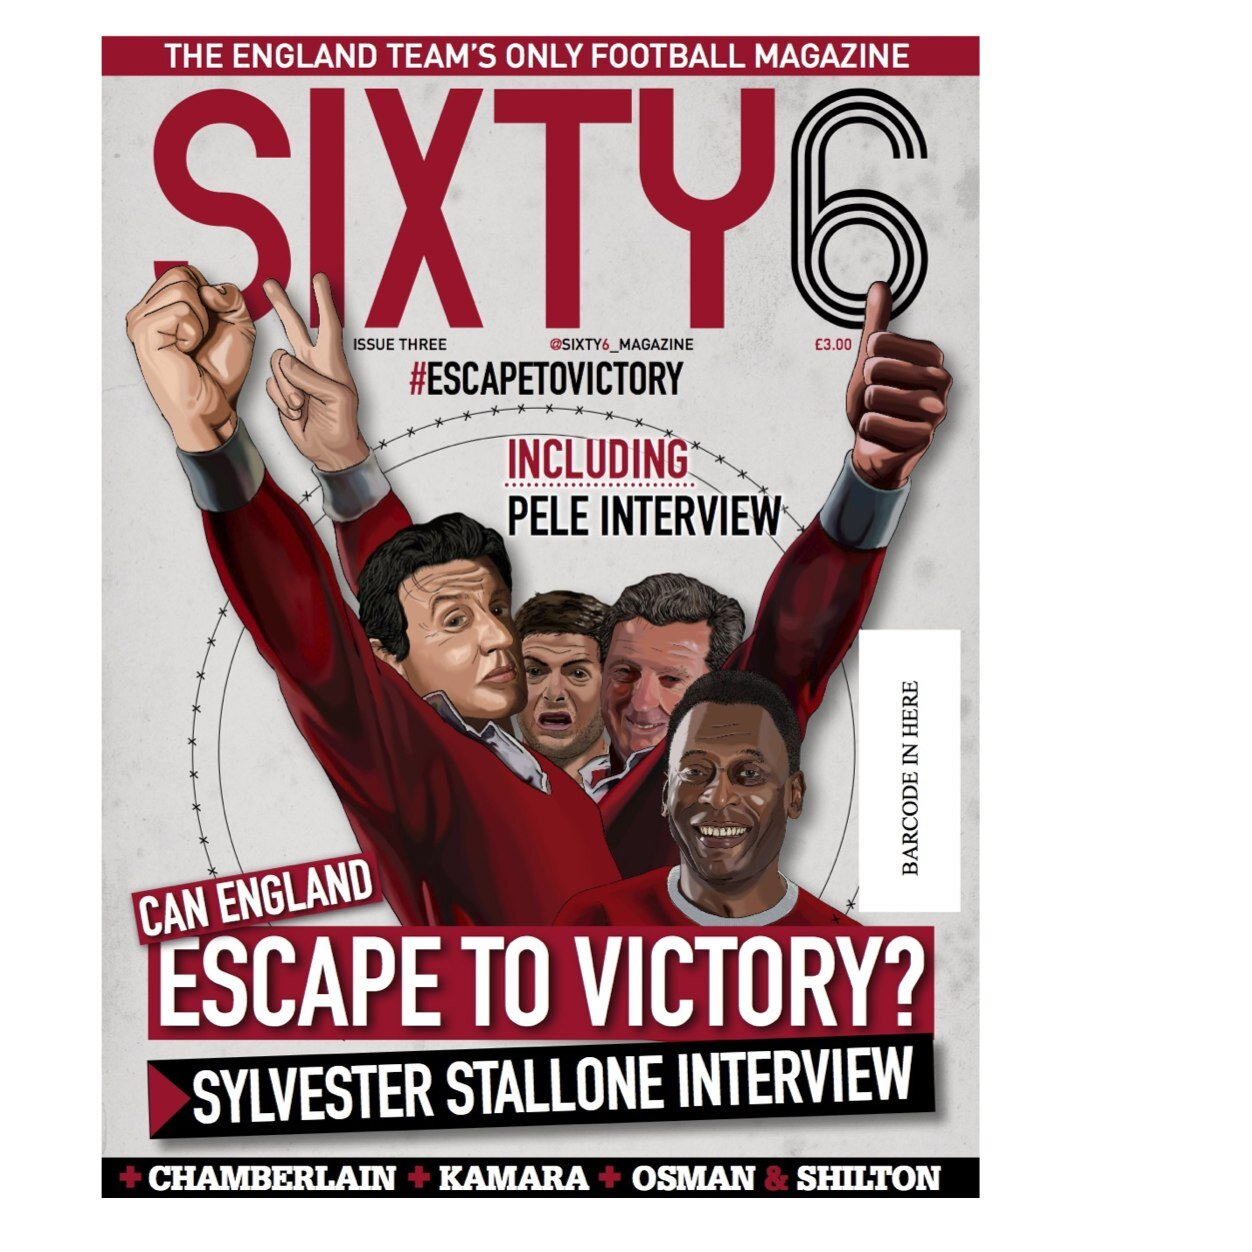 Sixty6 Magazine on Twitter: RT & follow @Sixty6_Magazine